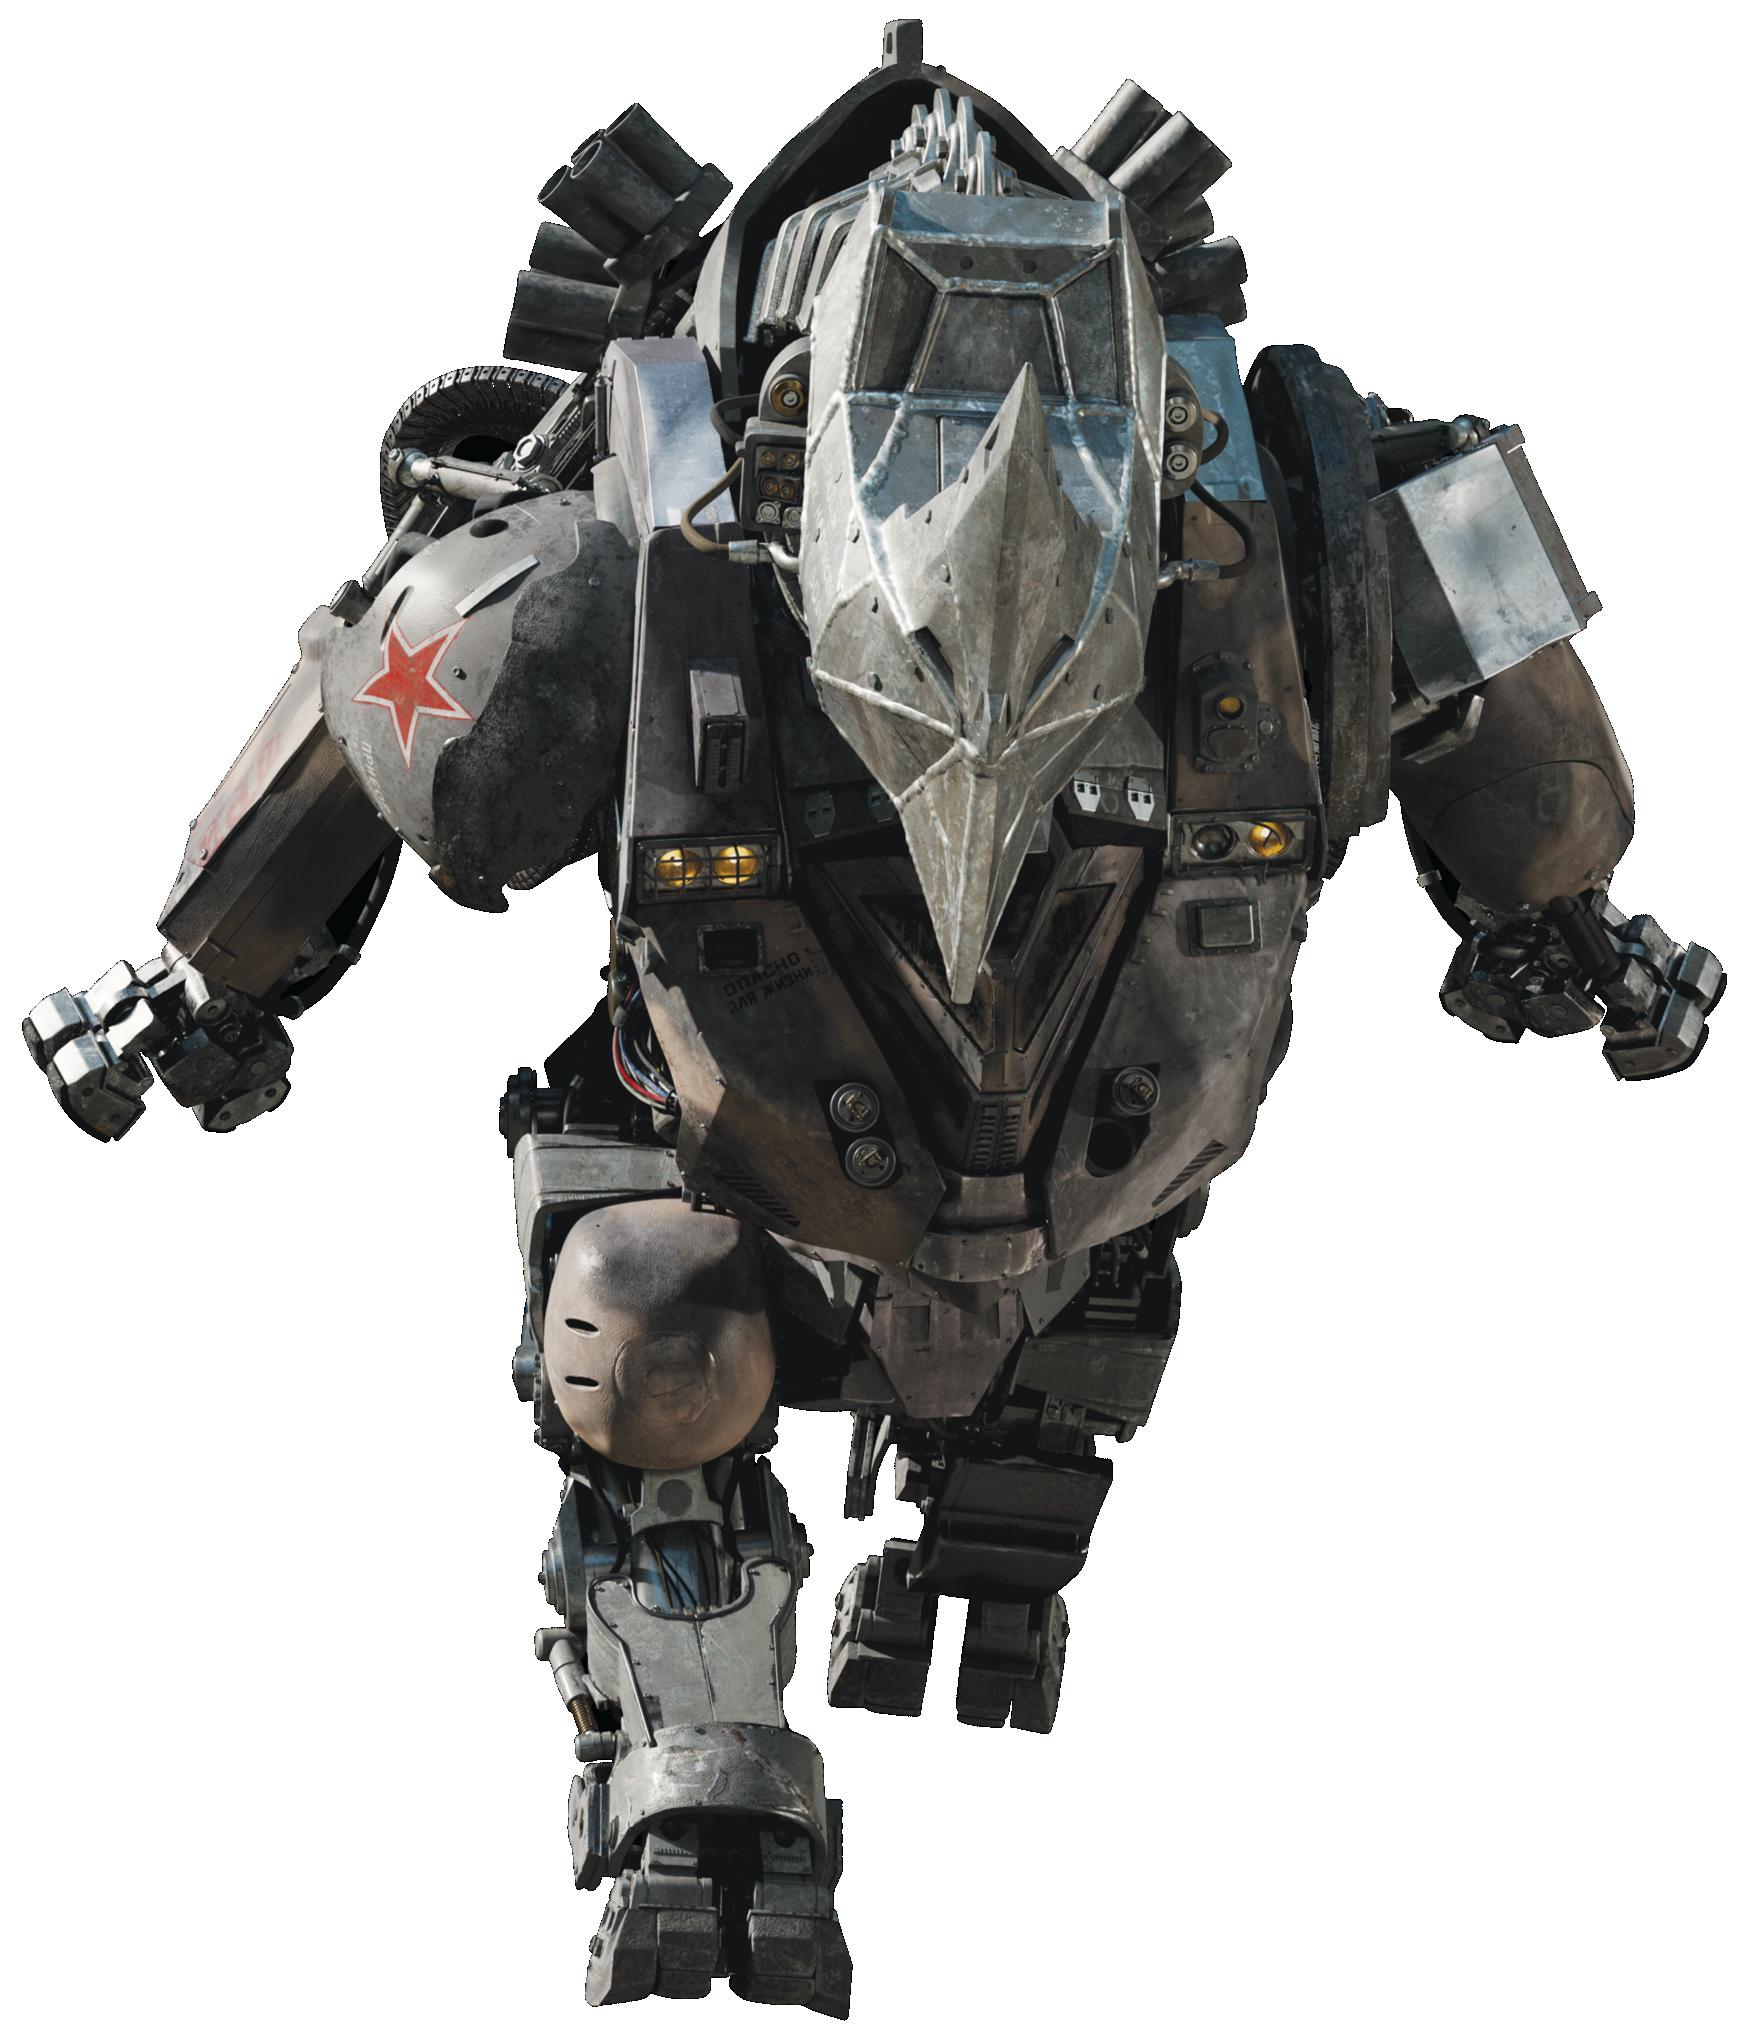 Rhino (Marvel) - Villains Wiki - villains, bad guys, comic ... |The Amazing Spider Man 2 Rhino Suit